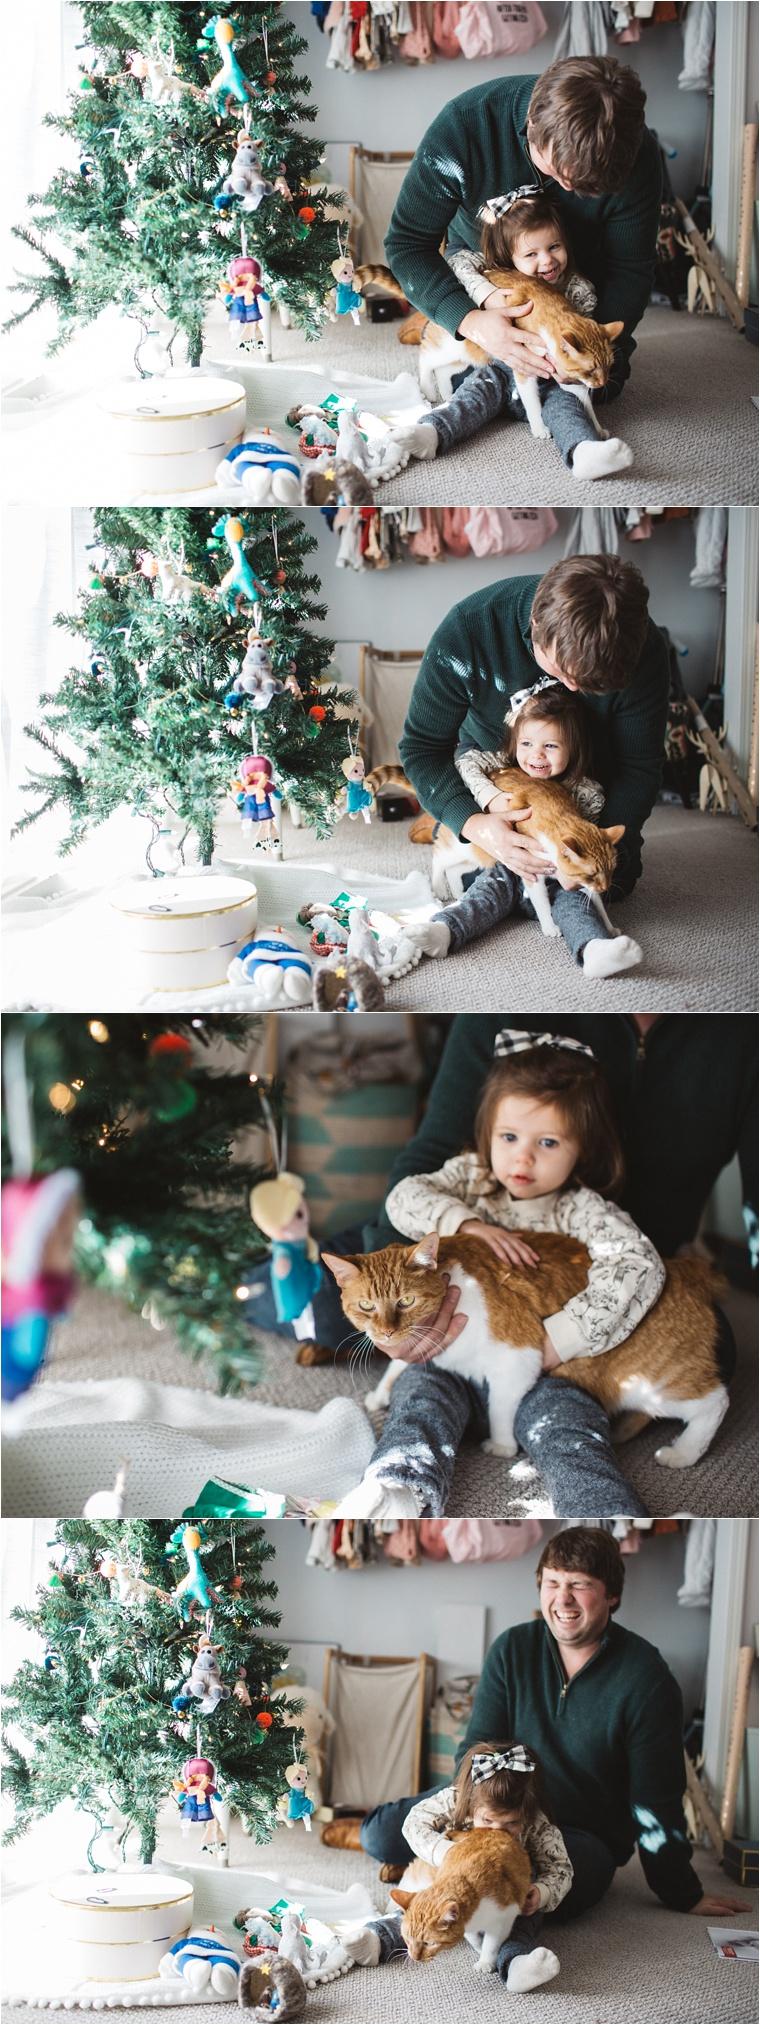 kansascityfamilyphotographer_0217